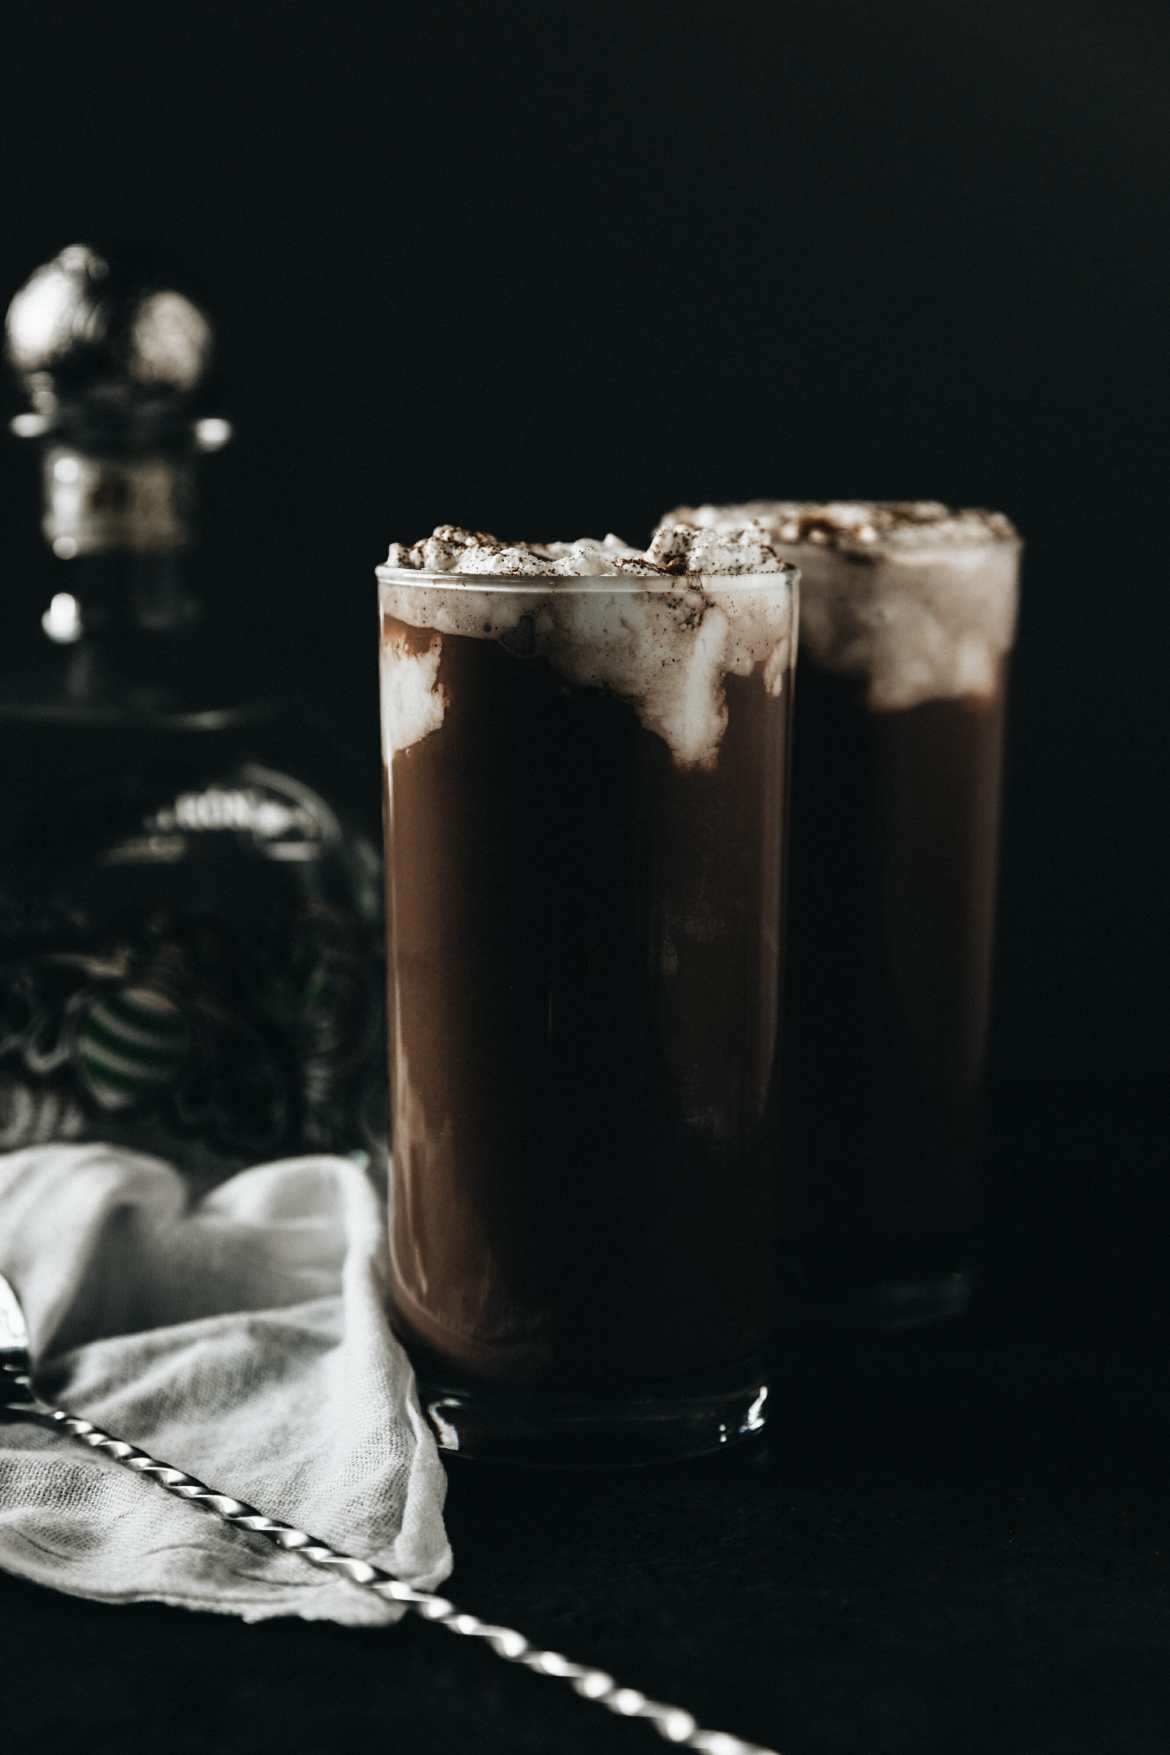 patron tequila chocolate milk